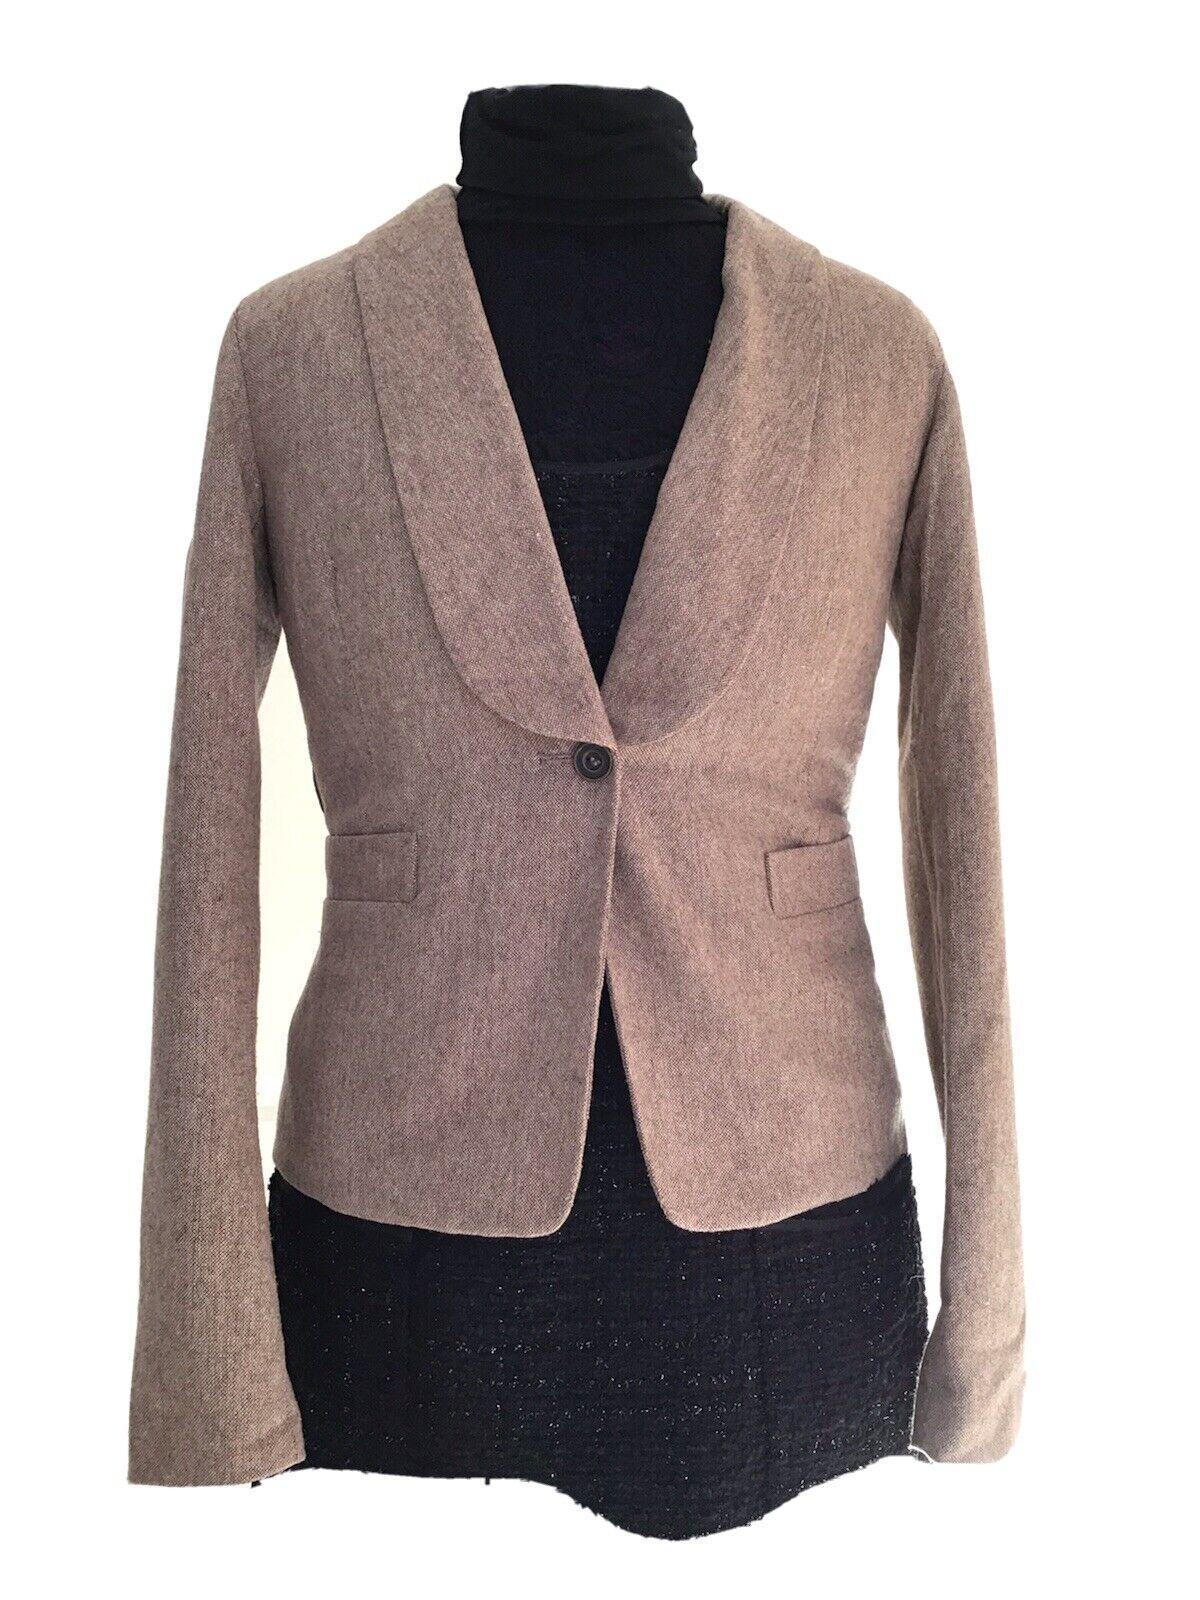 Vila Blazer Jacket Size XS 36 Beige Brown Ladies Figure stresses Top